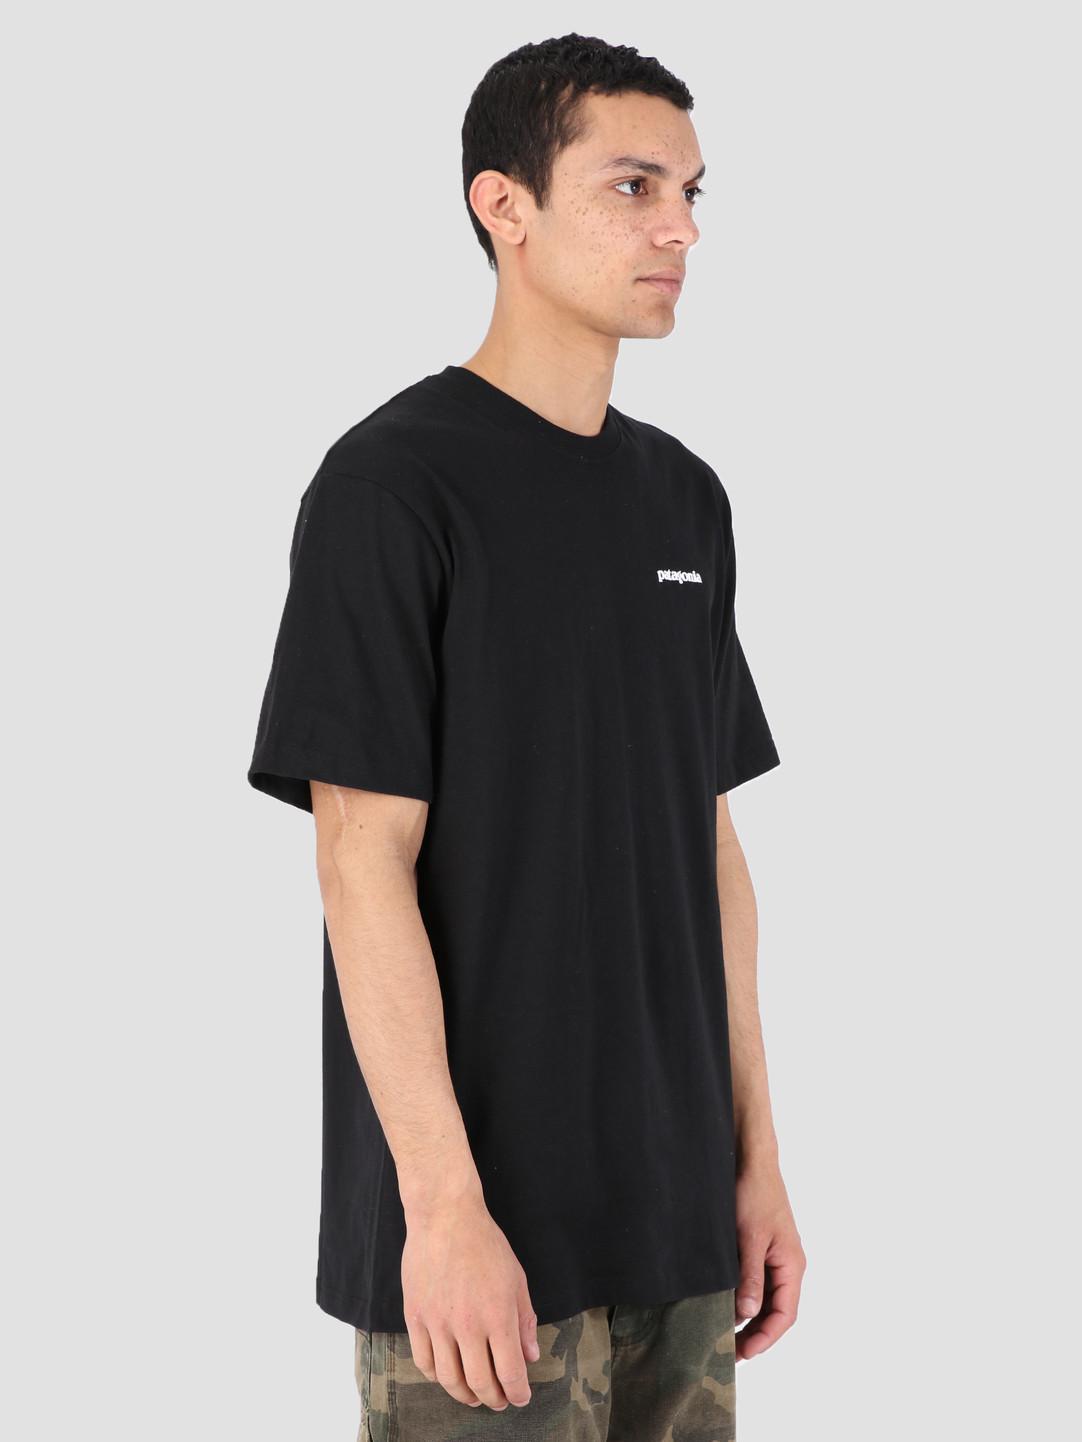 Patagonia Patagonia P-6 Logo Responsibili T-Shirt Black 39174